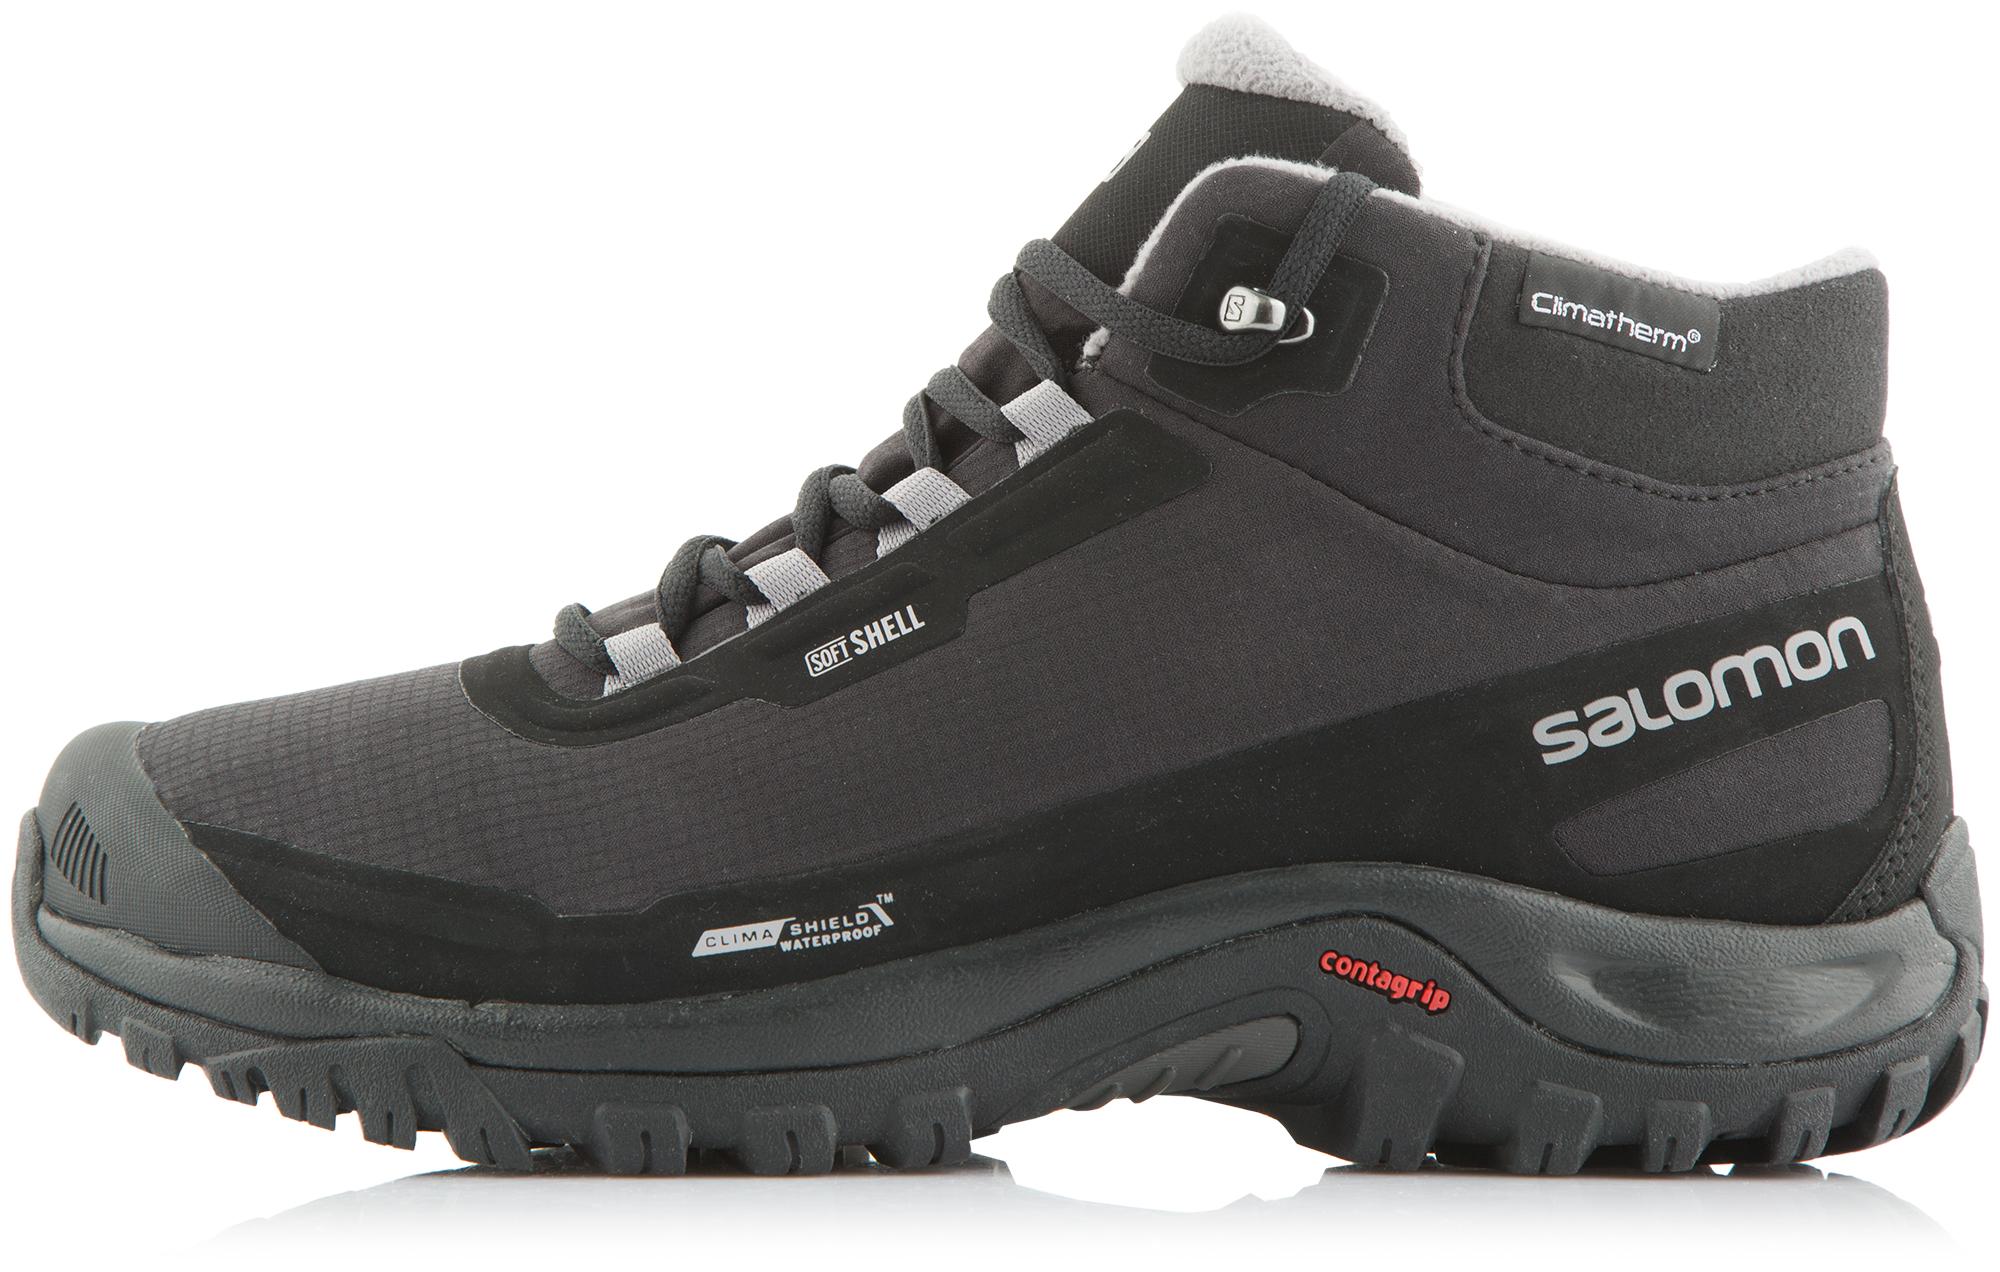 Salomon Ботинки утепленные мужские Salomon Shelter ботинки salomon ботинки shoes shelter spikes cs wp black bk ptr